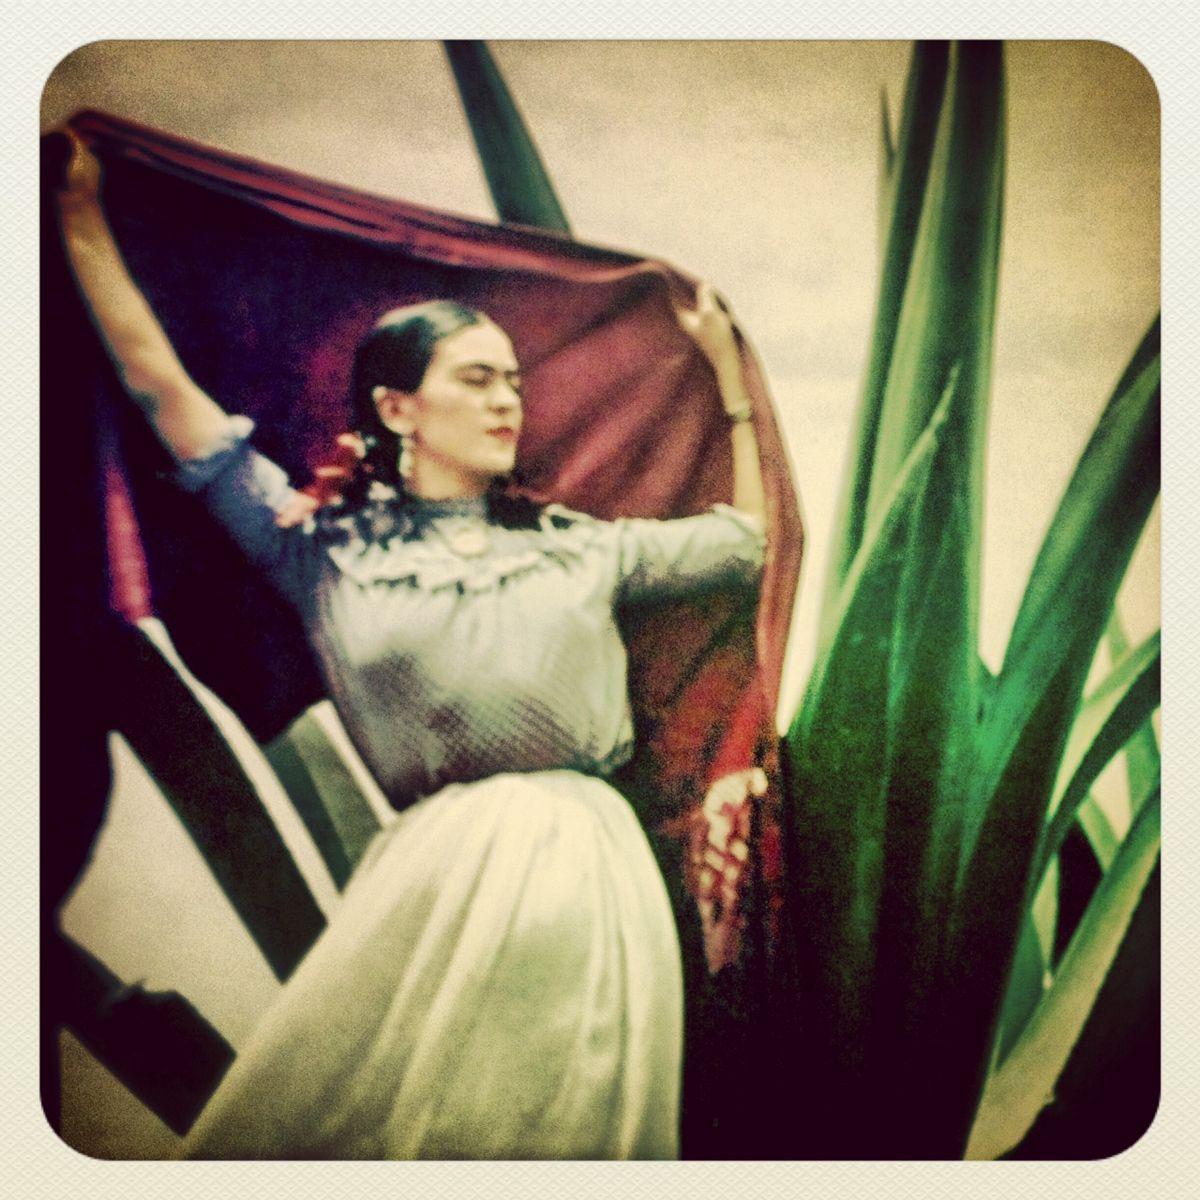 SUPERFICIALsnapshots: Frida Kahlo